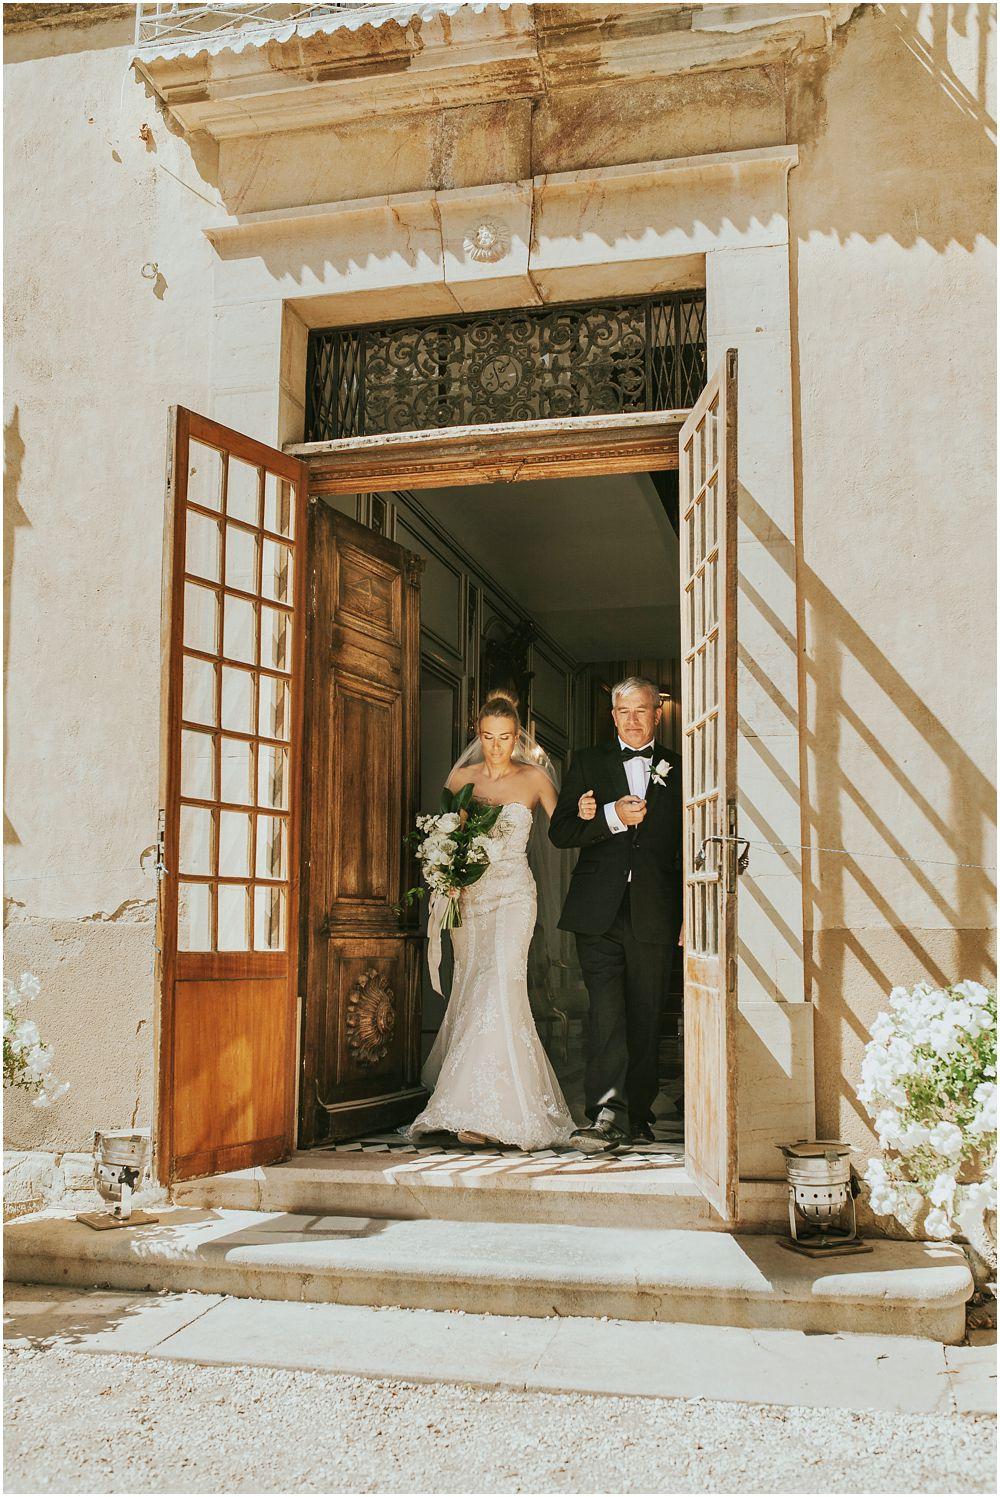 Chateau_de_Robernier_Weddings_SamanthaDavisPhotography©009.jpg